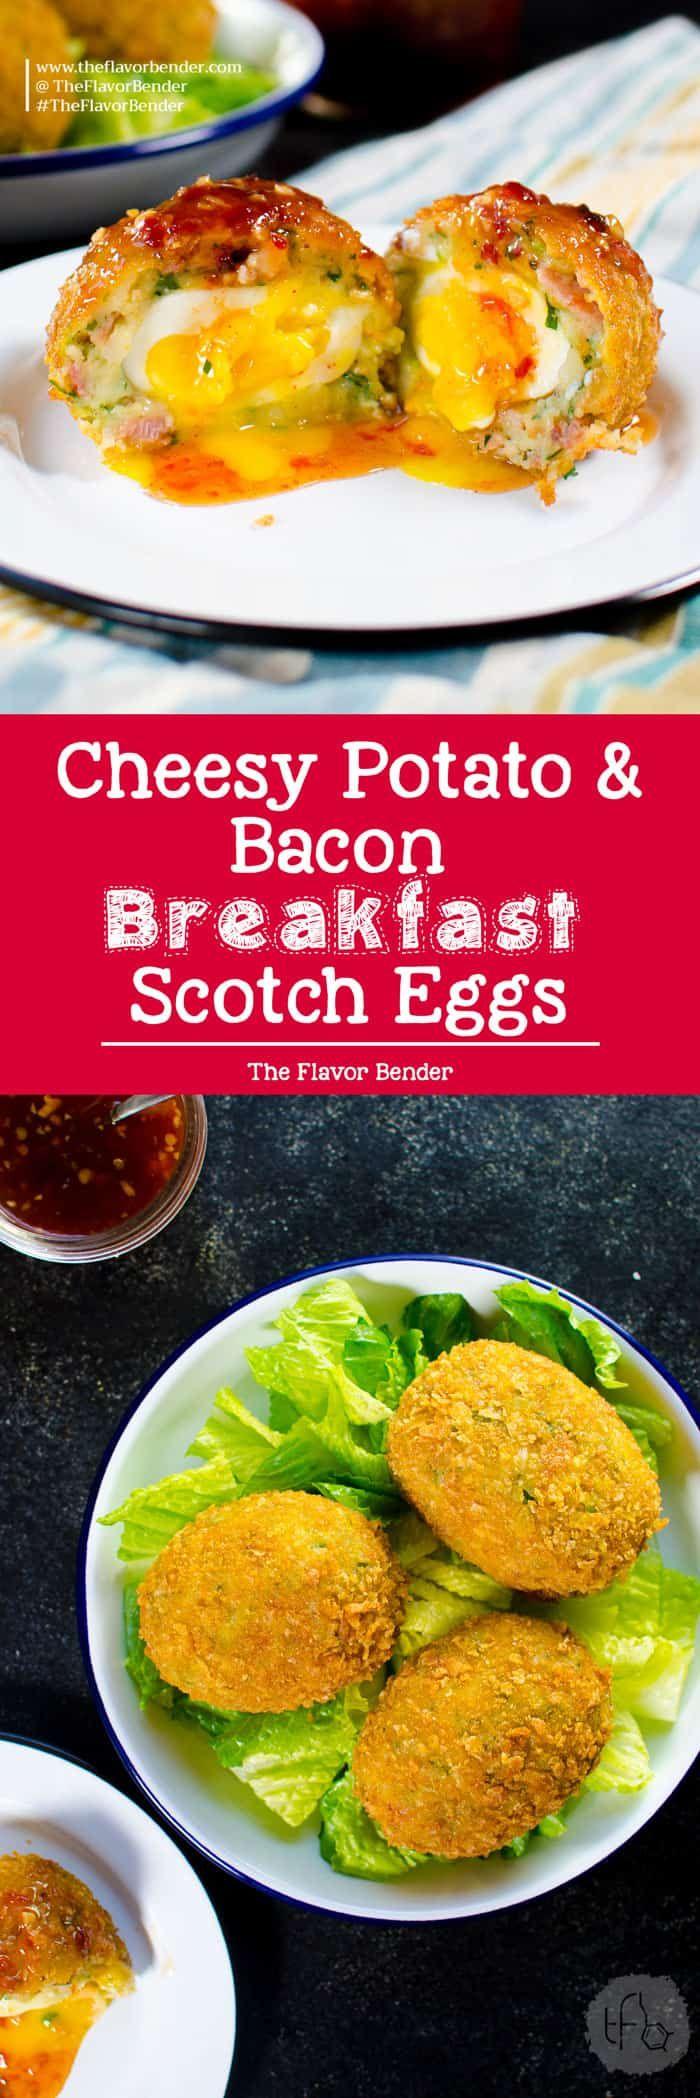 Cheesy Potato & Bacon Scotch Eggs (Breakfast Scotch Eggs) - The Flavor Bender